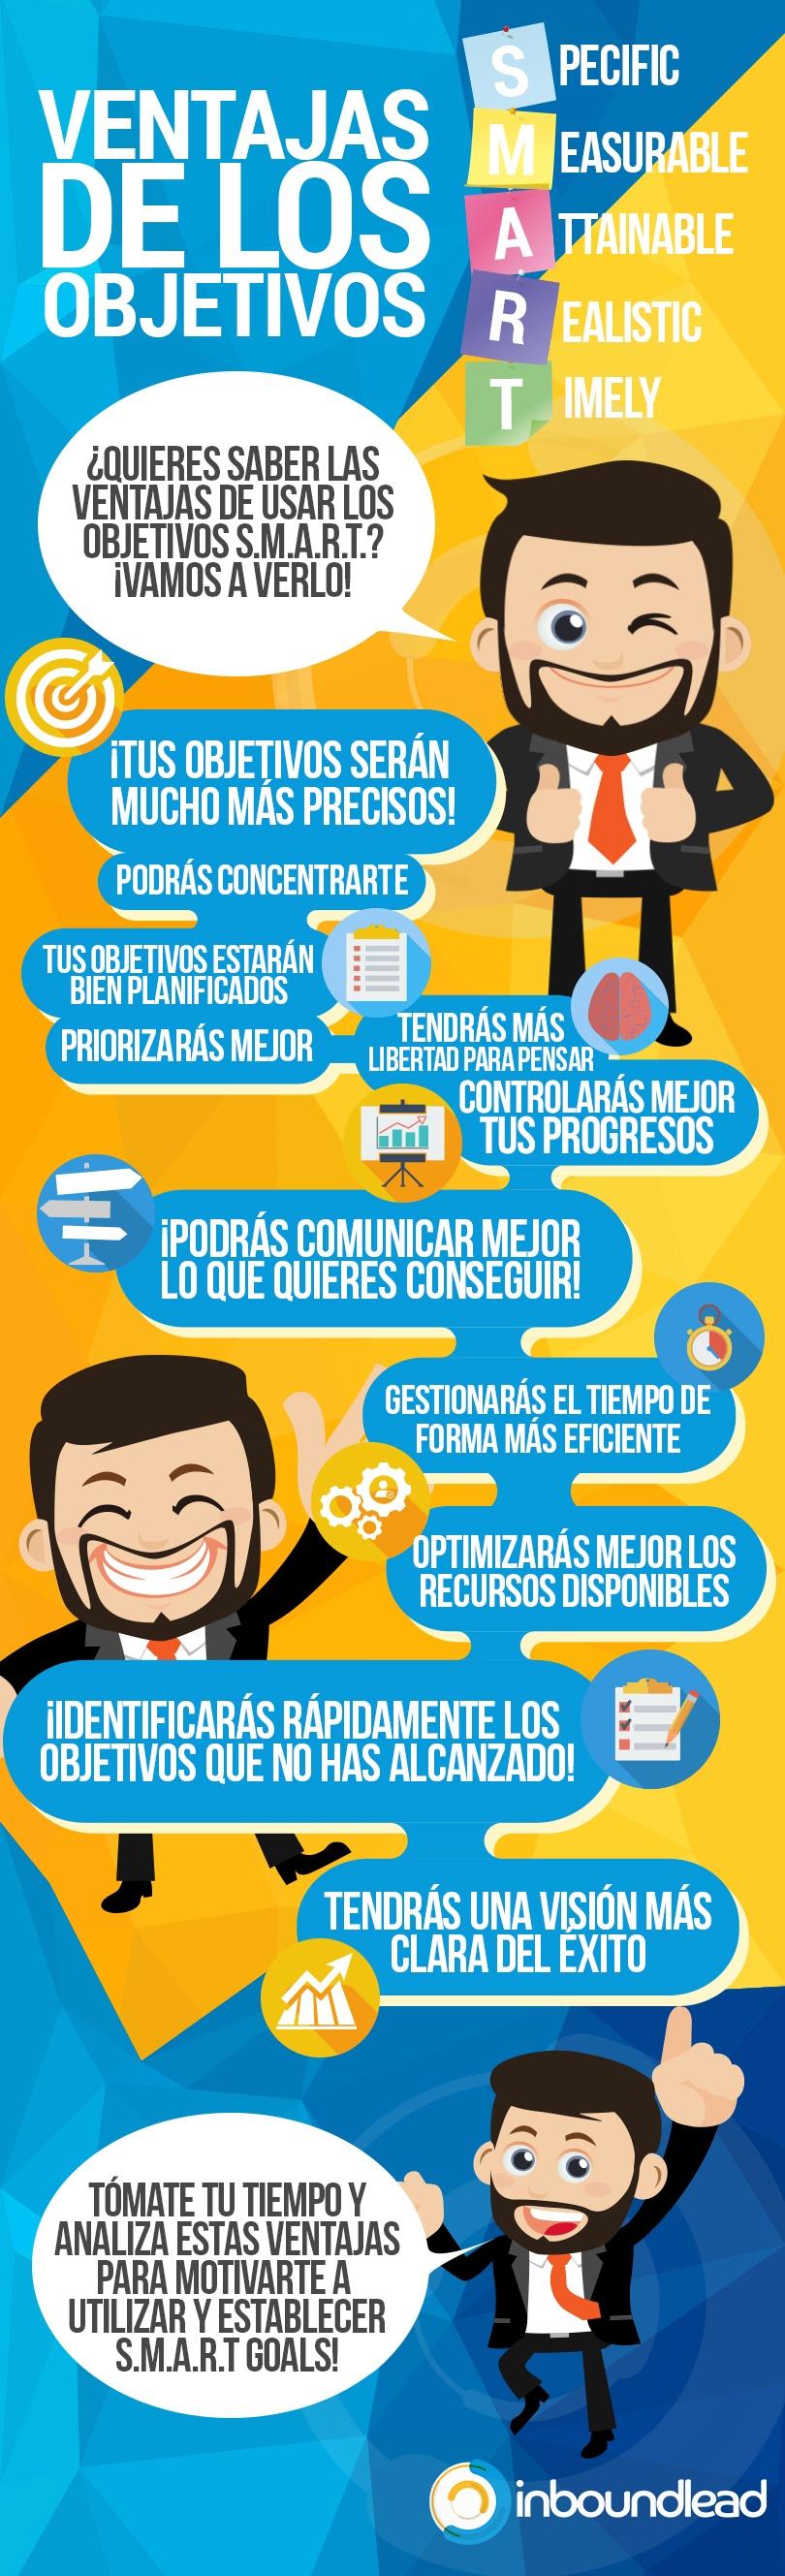 Ventajas de los Objetivos Smart #infografia #infographic #marketing